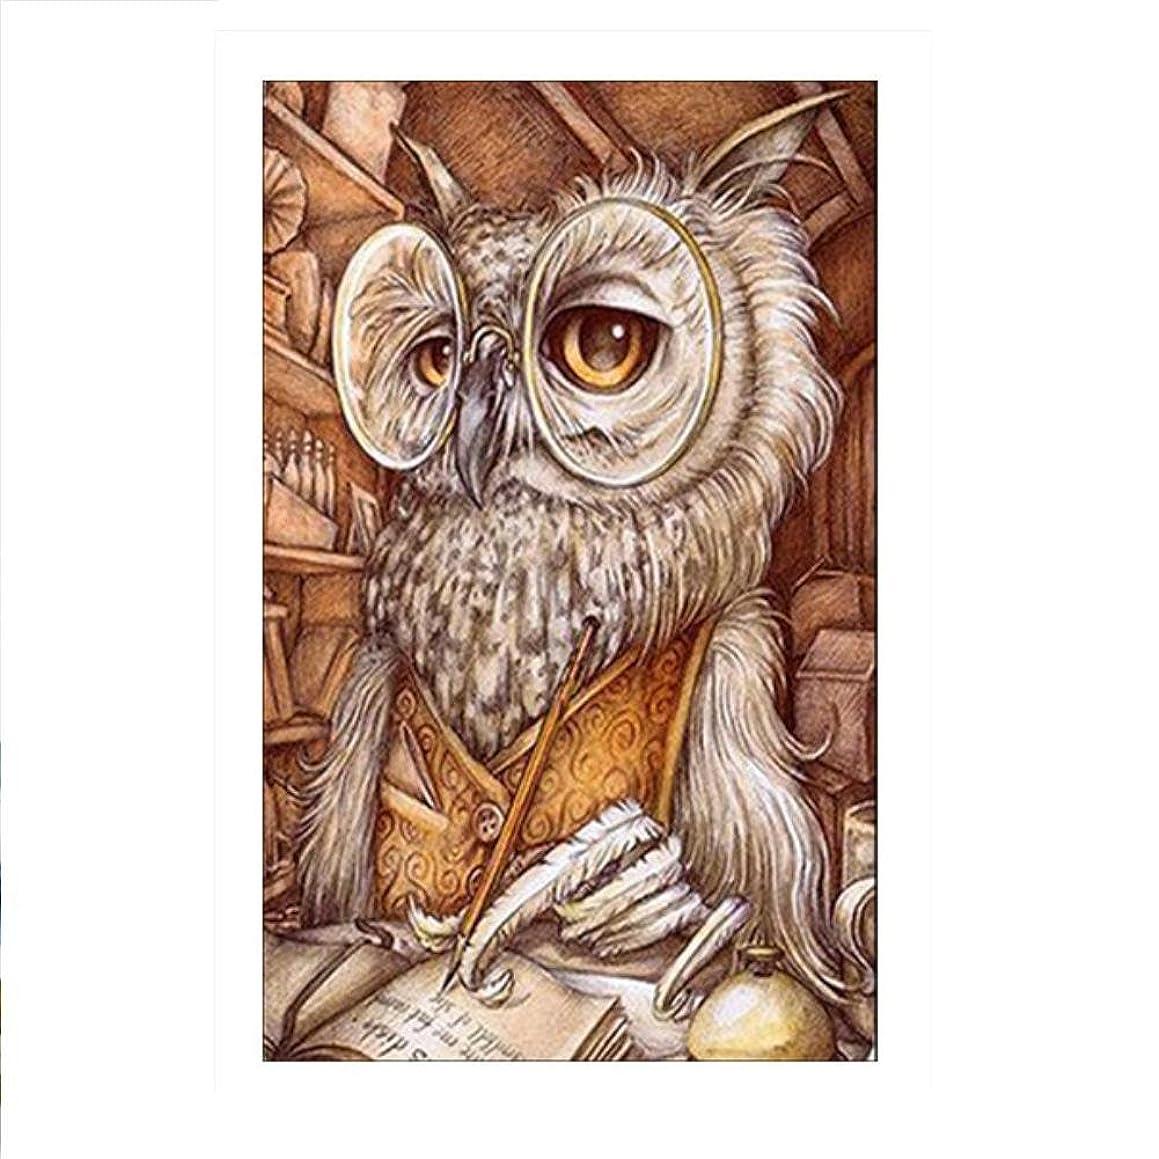 DIY 5D Full Drill Diamond Sticker Cross Stitch Painting Kits Arts Crafts Home Decor Owl Doctor 20 x 30cm (7.8